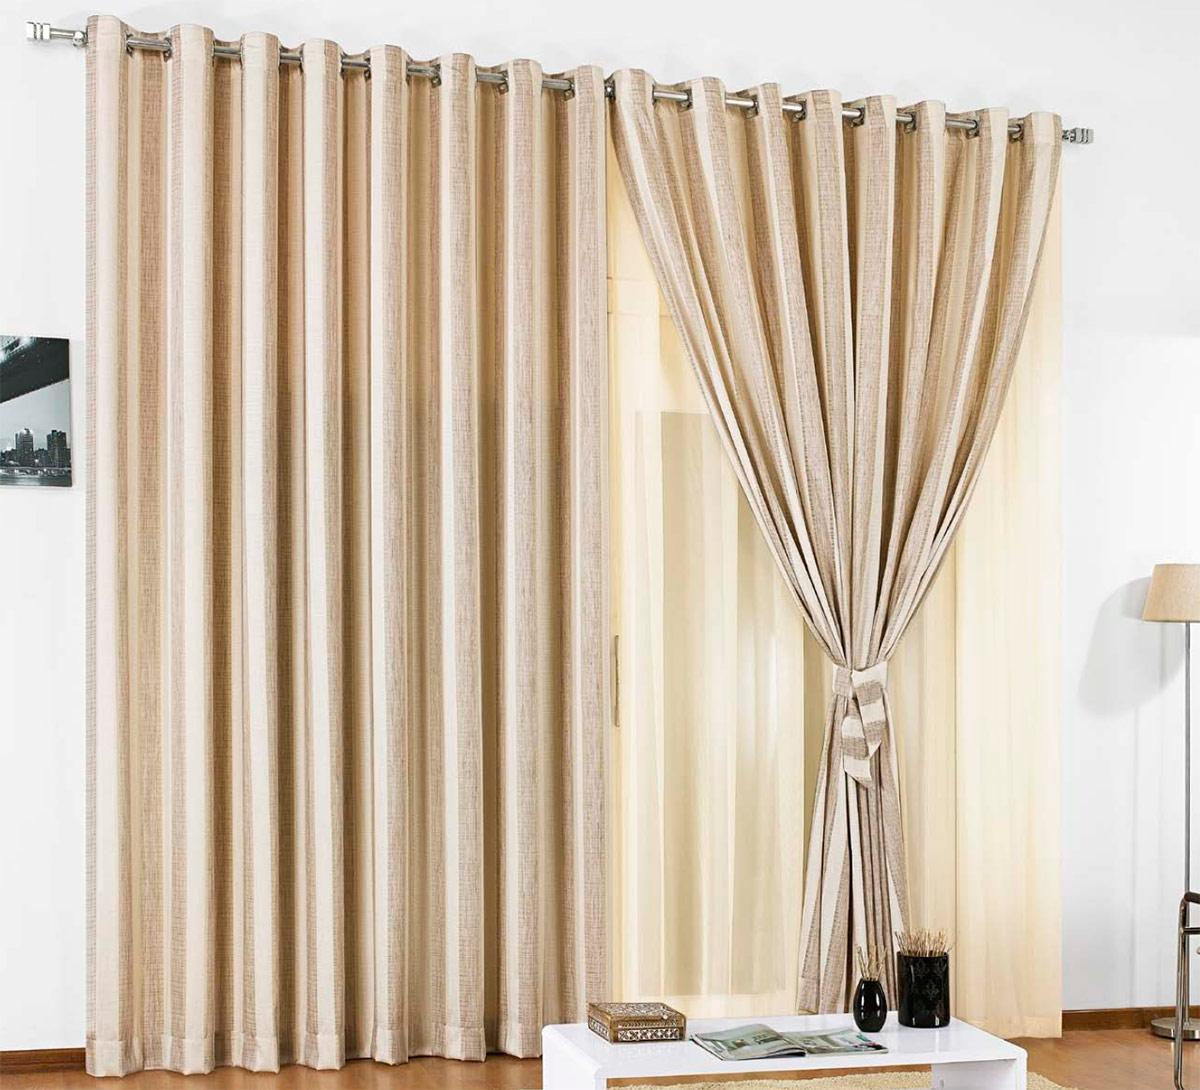 Cortina sala e quarto 3 metros palha seda e poliester cortina sol casa sua beleza - Cortinados modernos ...